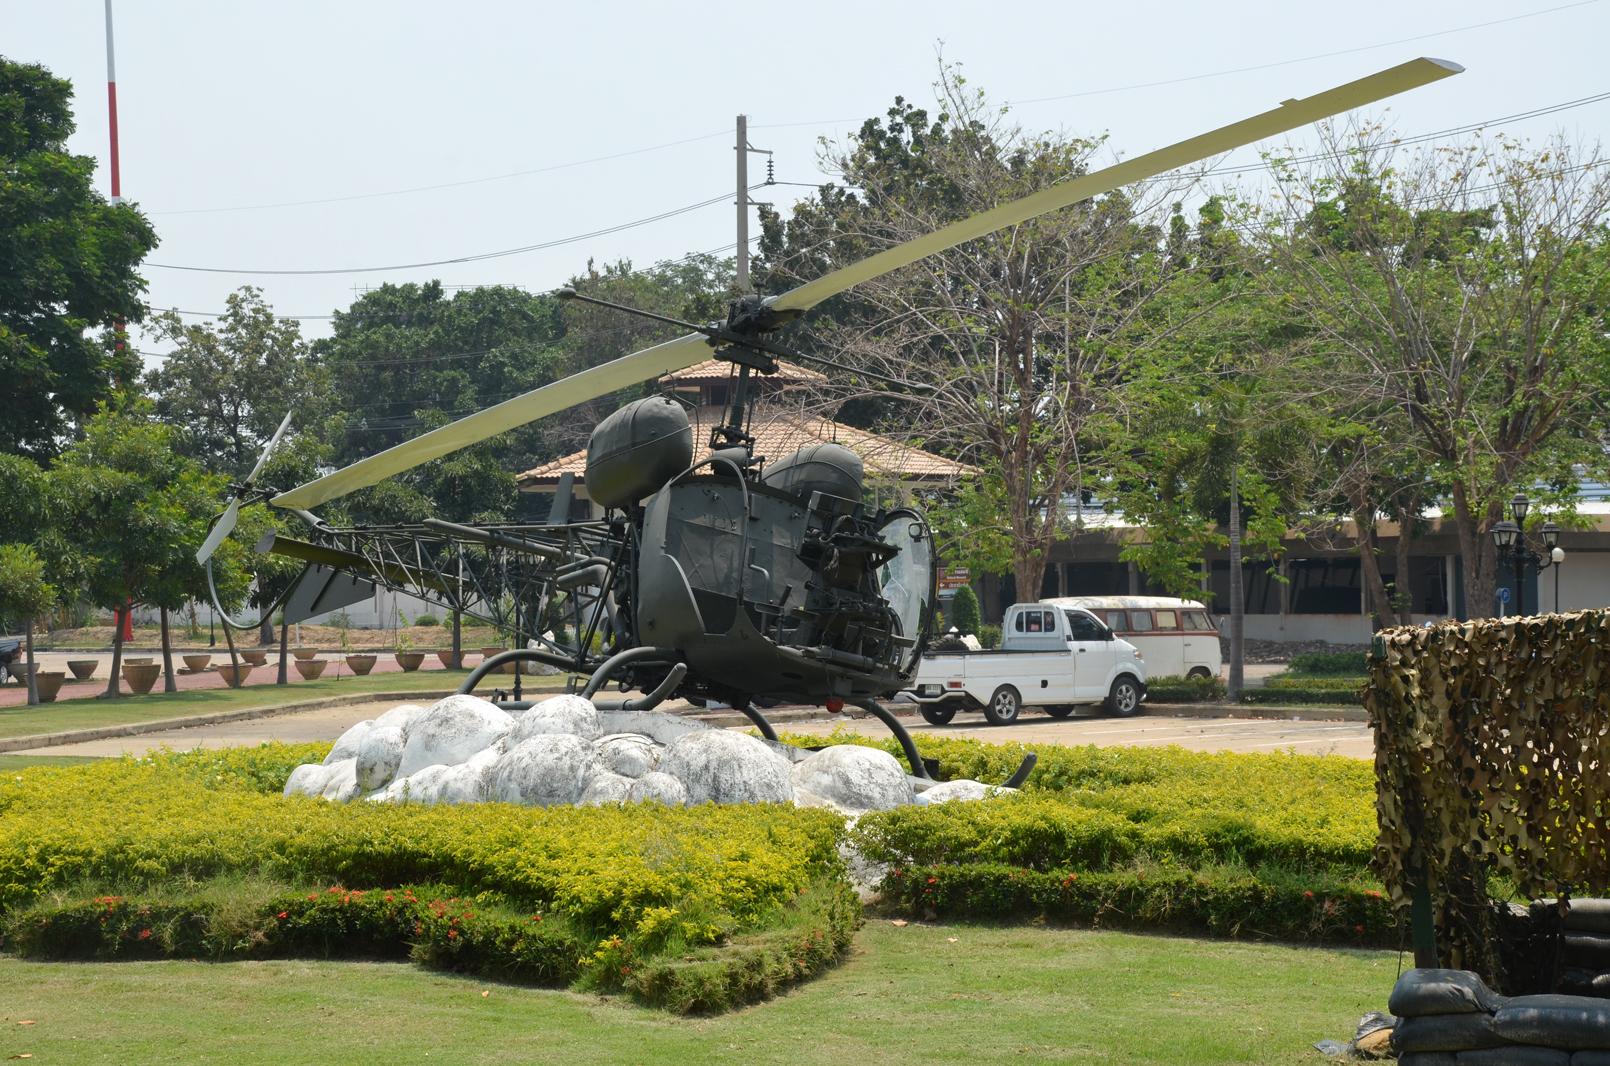 National Memorial อนุสรณ์สถานแห่งชาติ Bangkok, Thailand